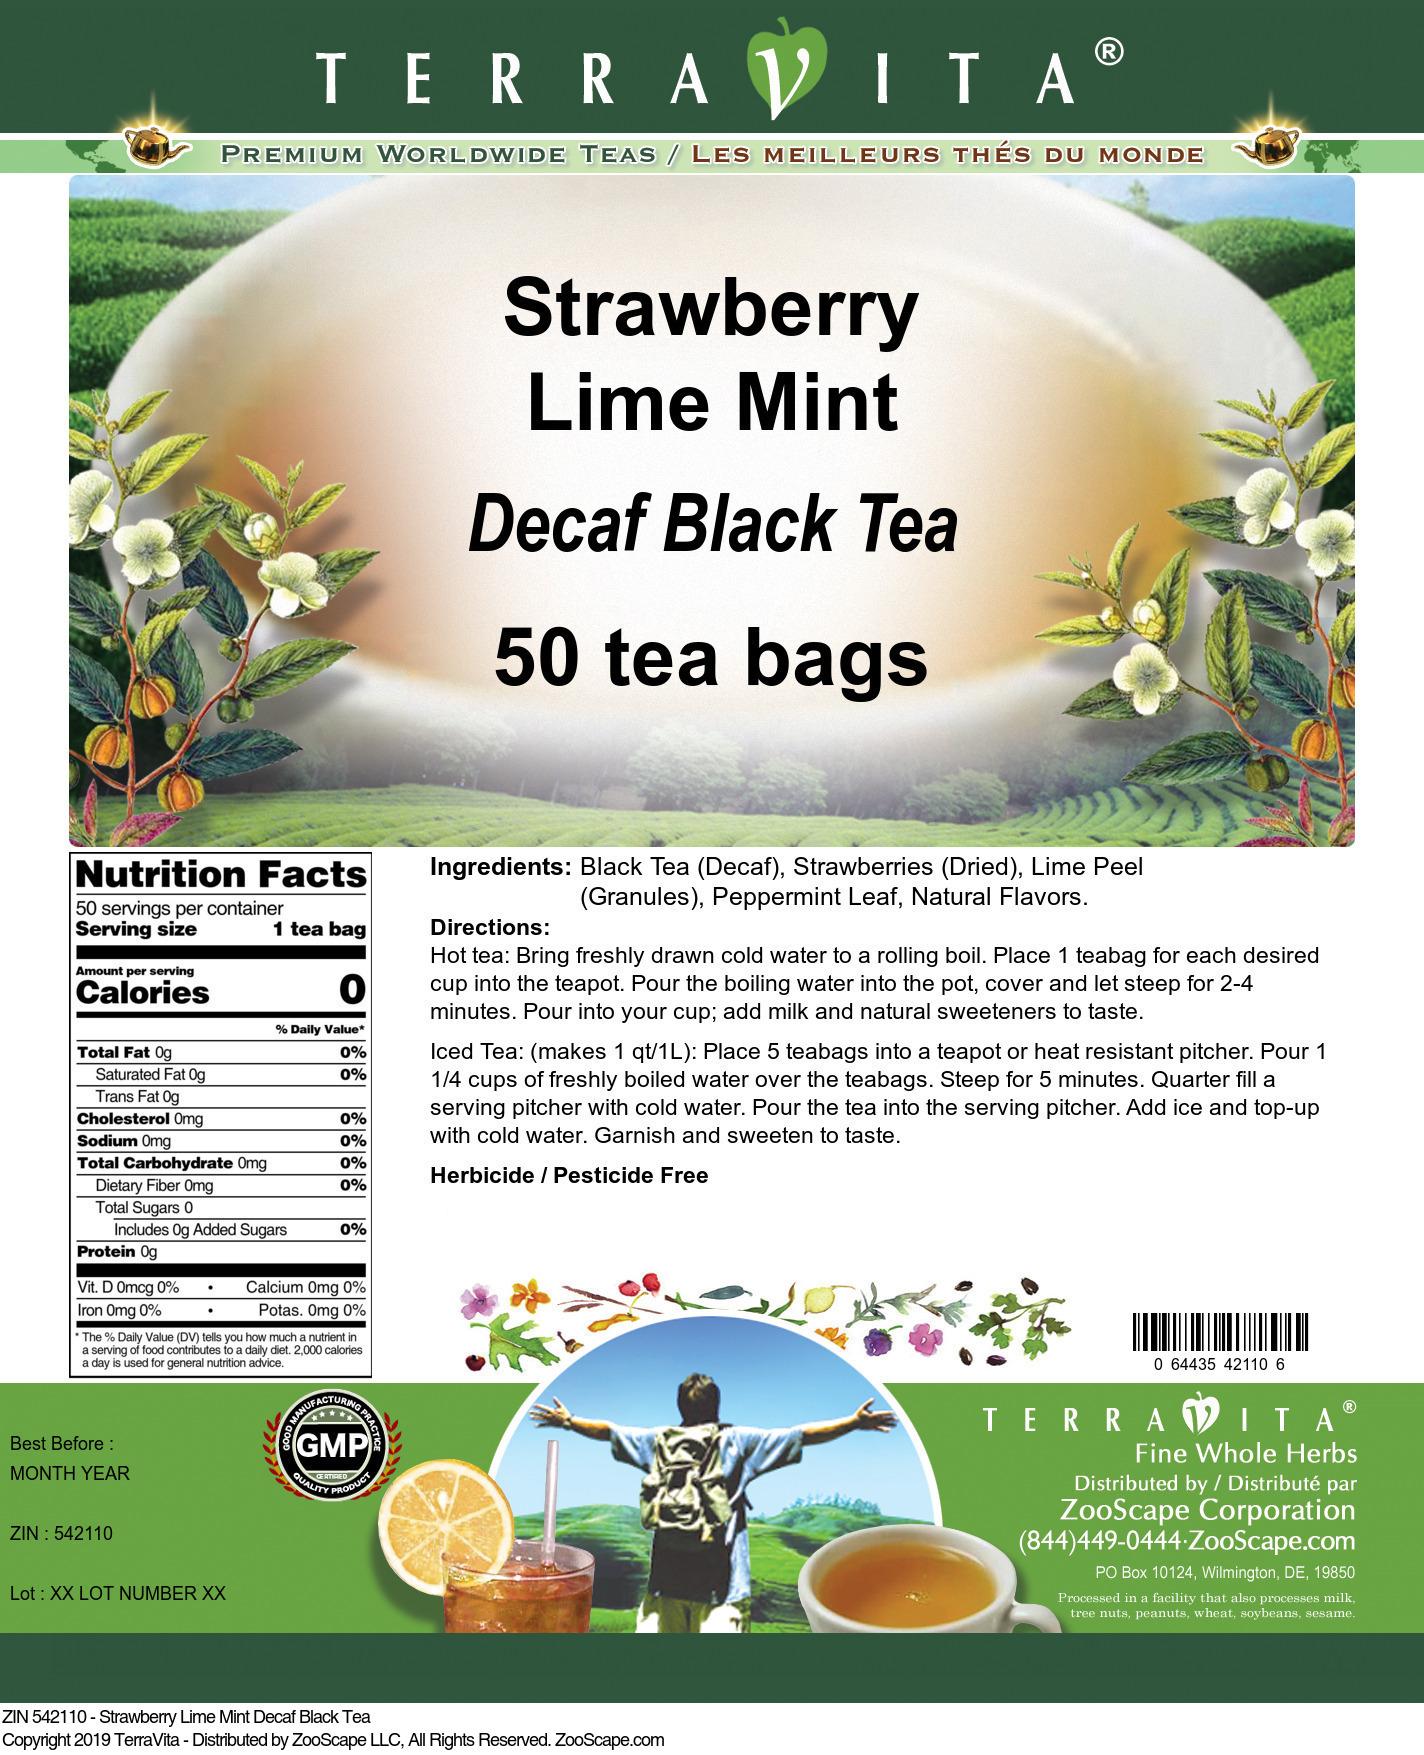 Strawberry Lime Mint Decaf Black Tea